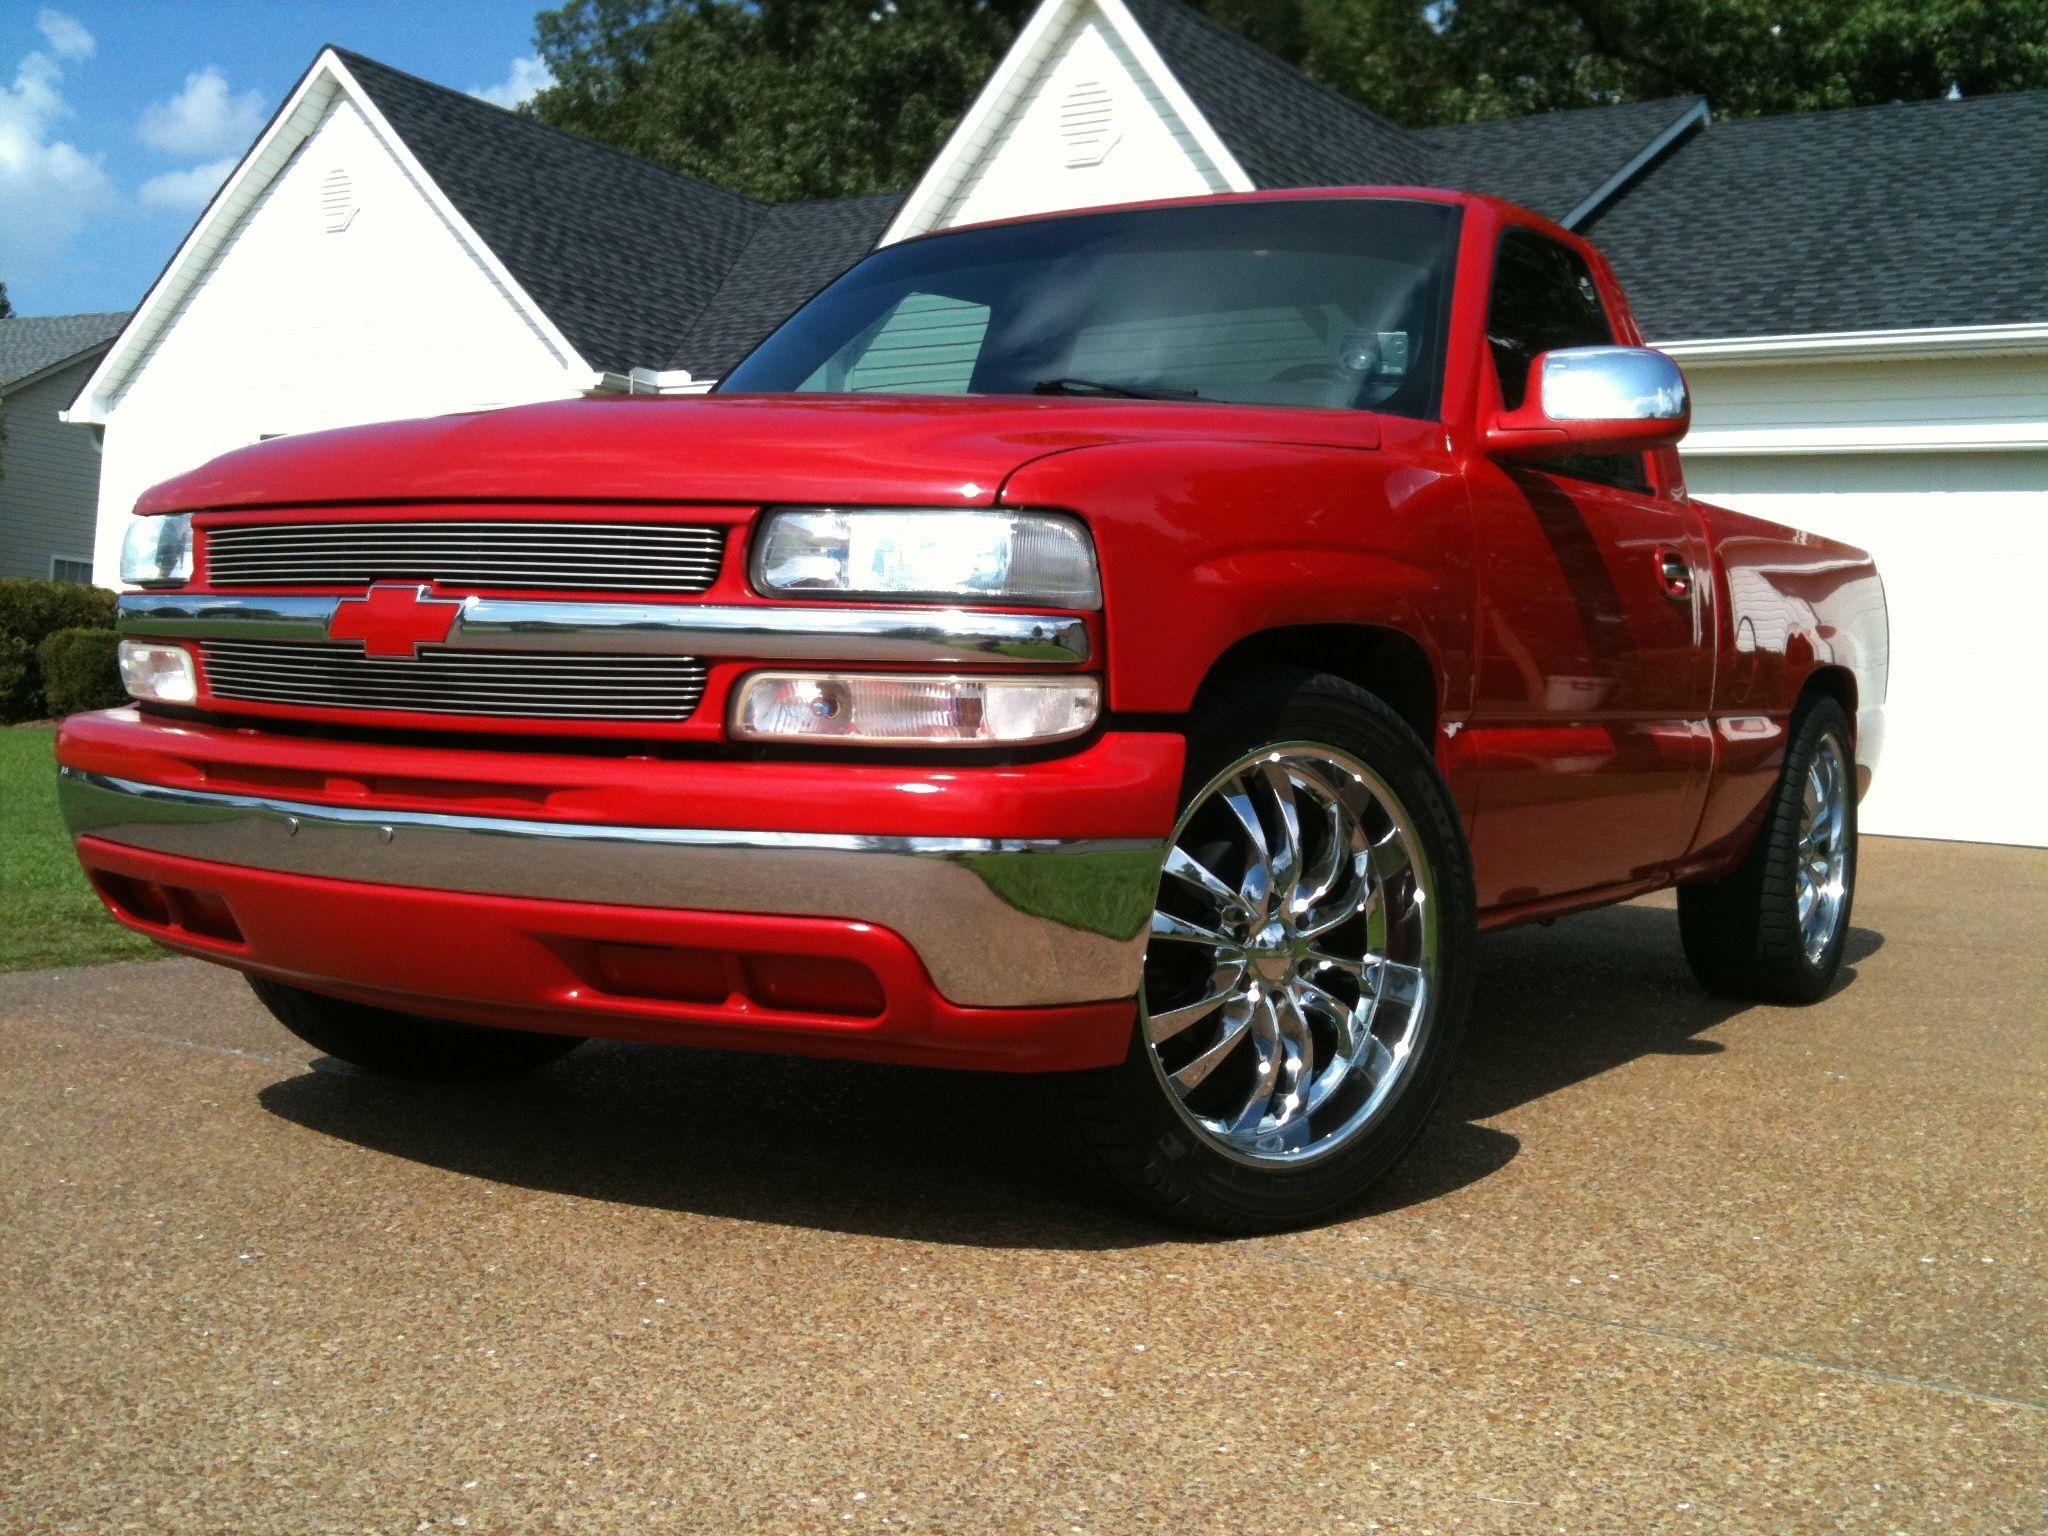 facebook peterslongview chevrolet home peters fiat id autom viles longview texas ram jeep dodge media chrysler